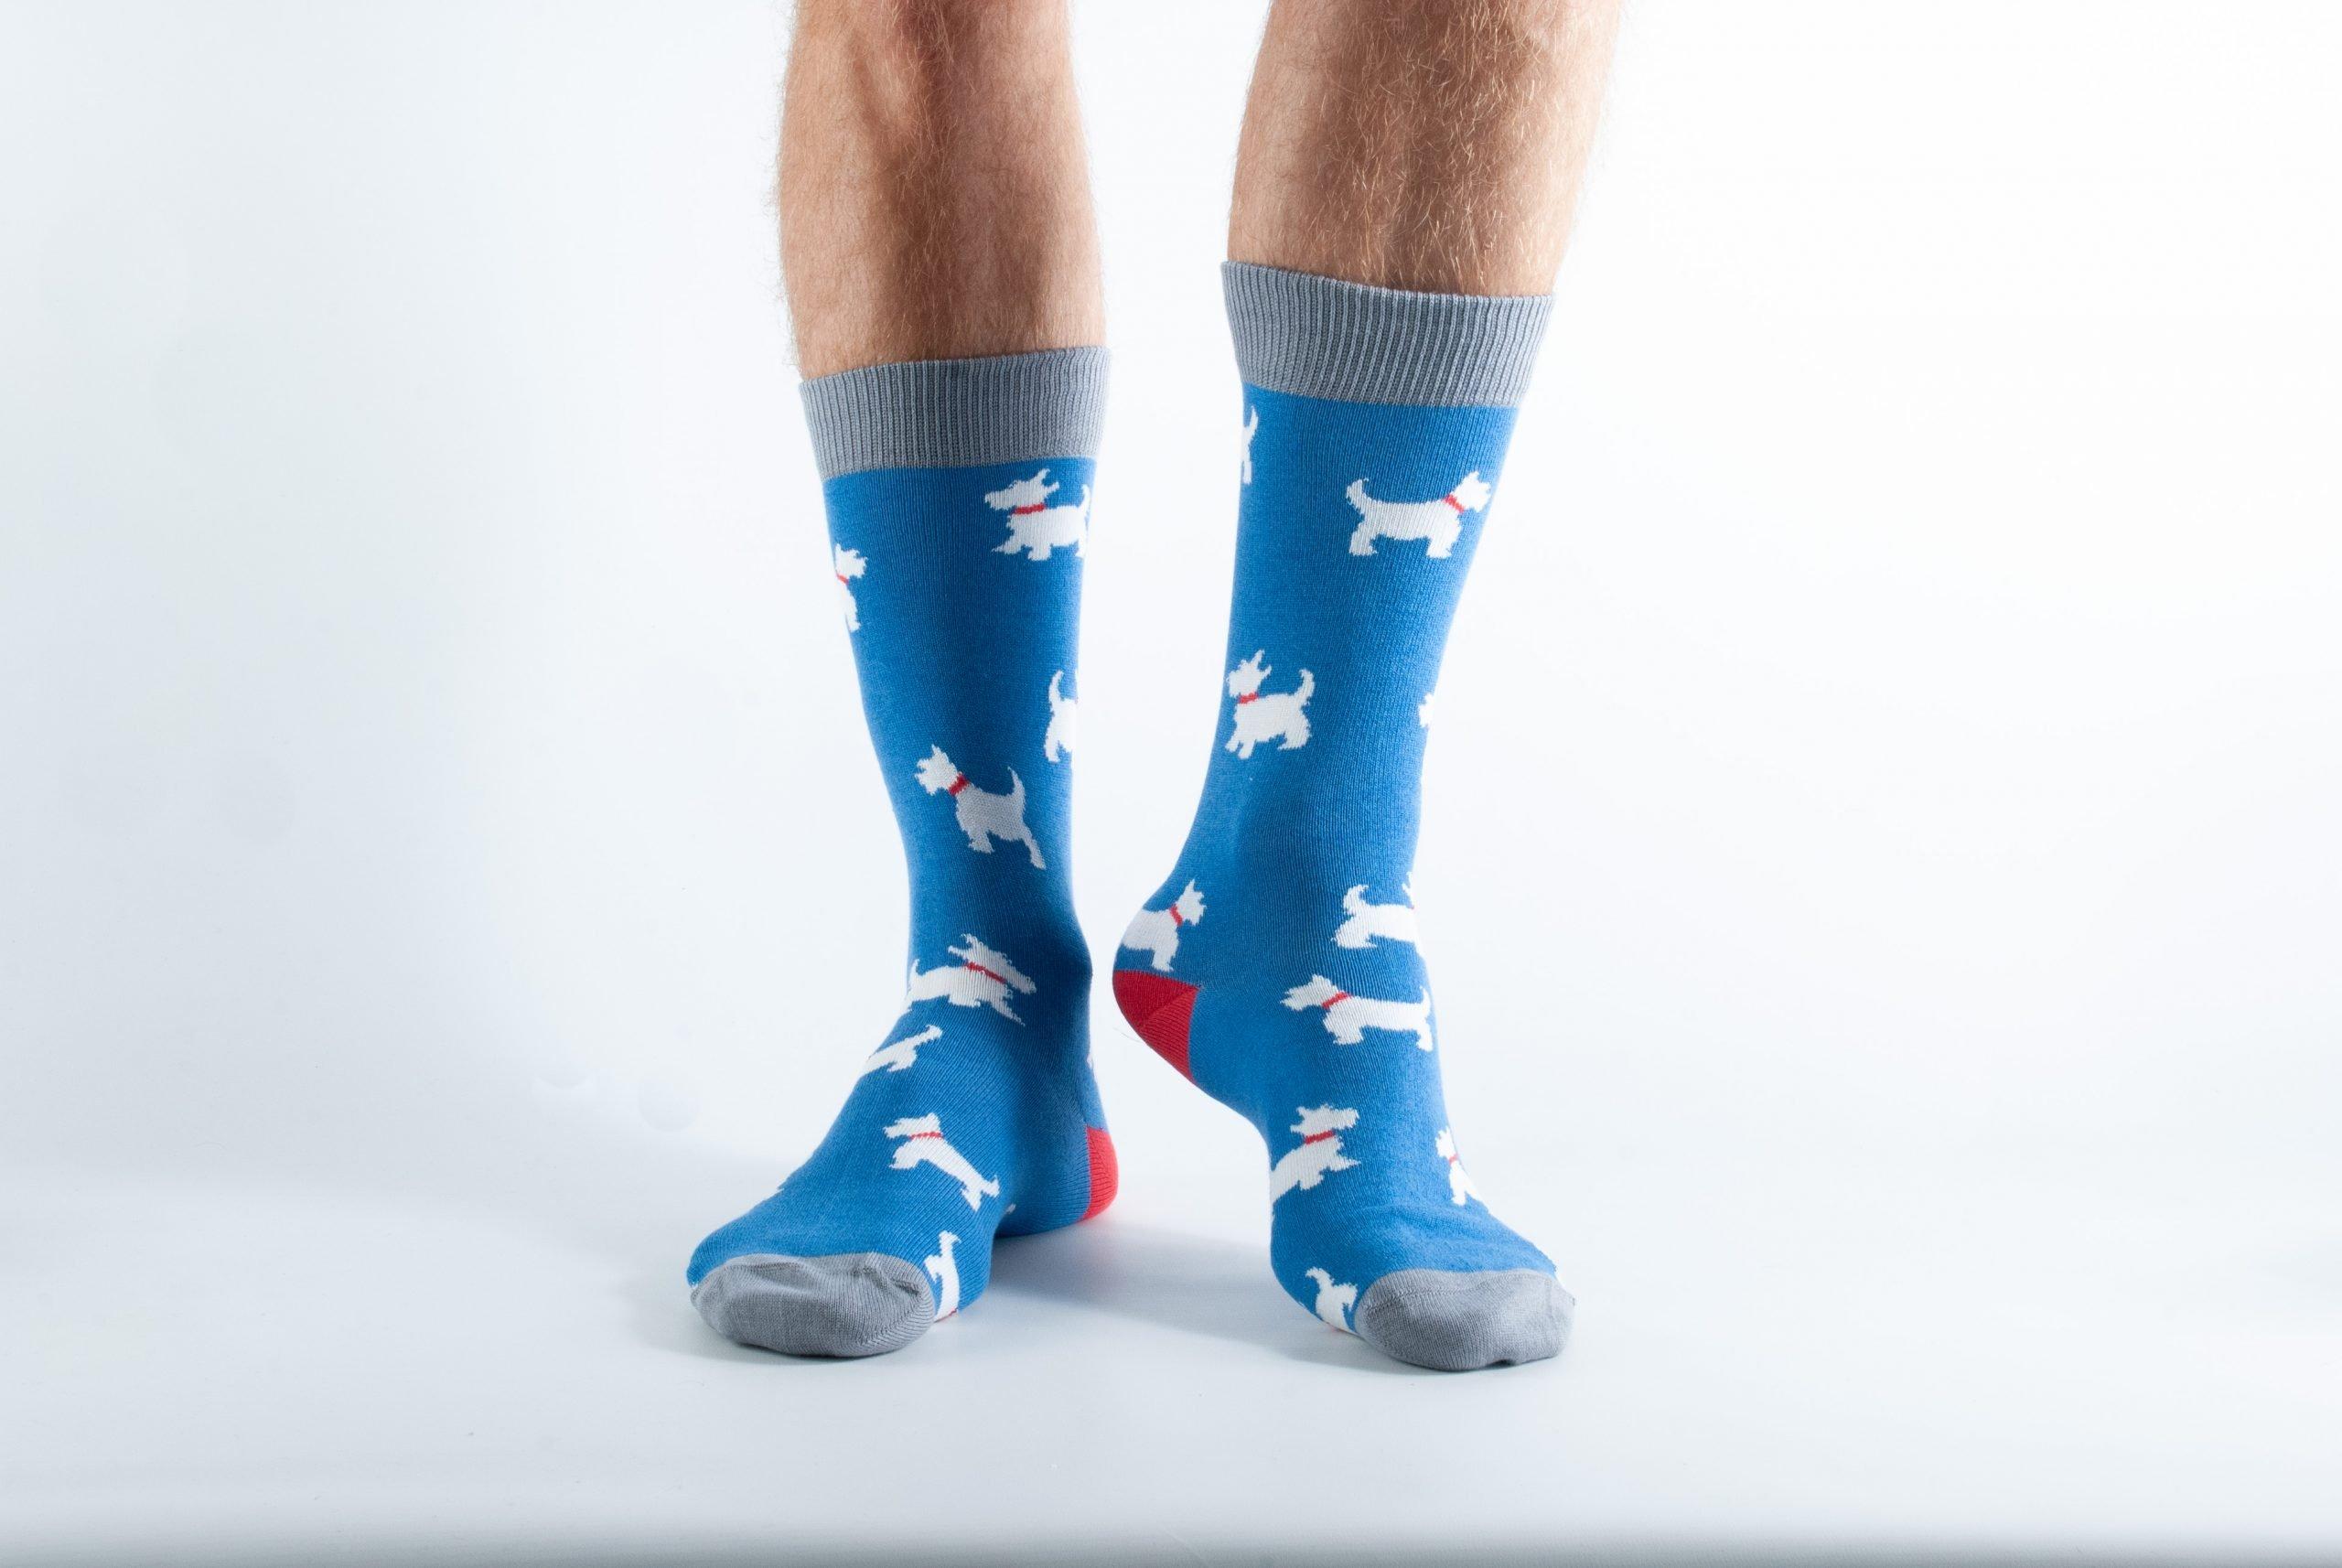 Mens Scottie dog bamboo socks - blue and grey